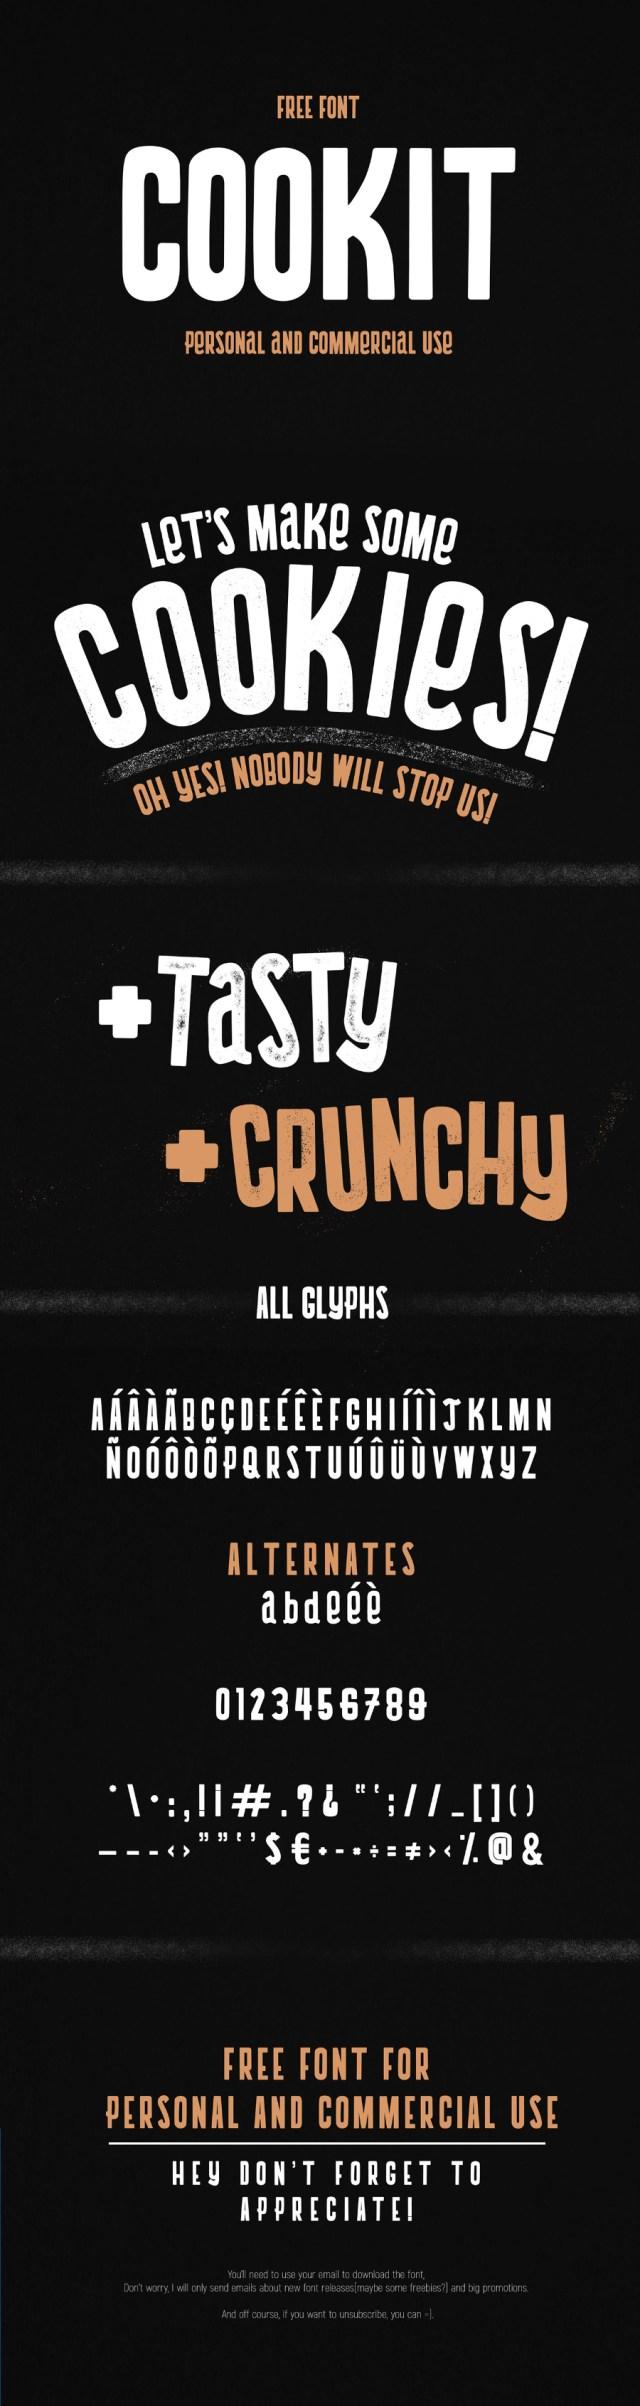 Cookit Display Free Typeface